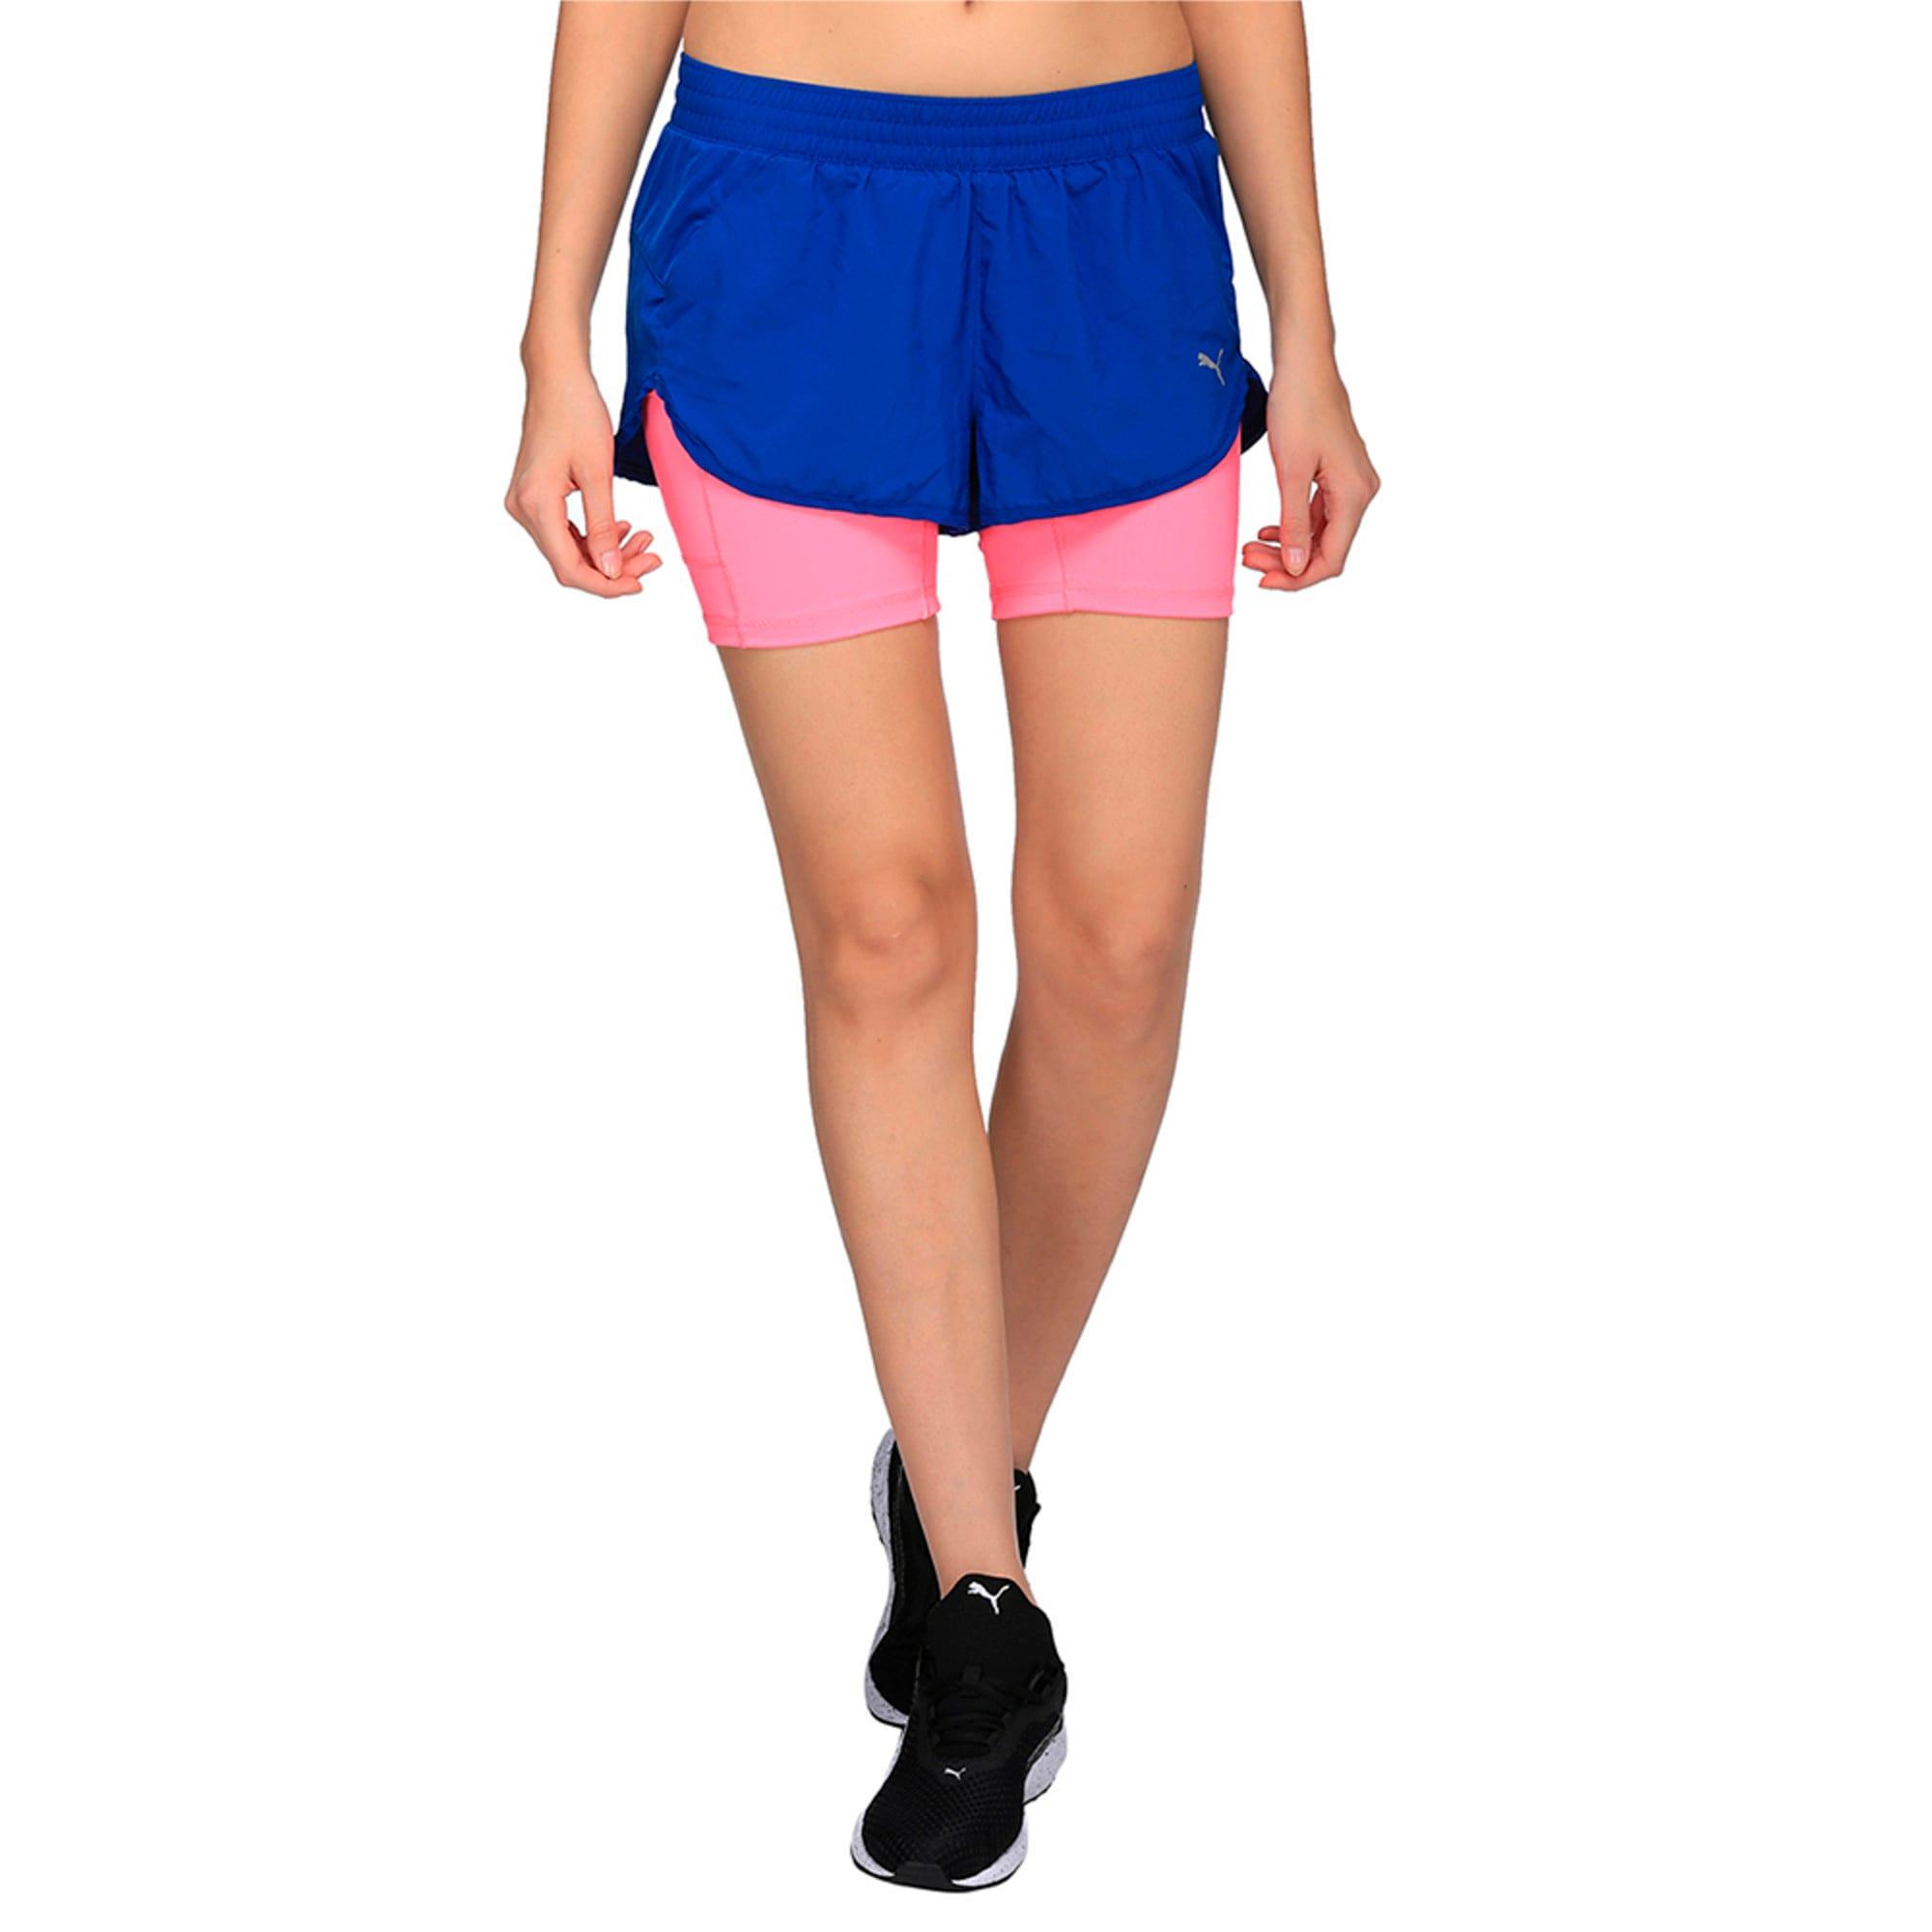 Thumbnail 4 of Running Women's Blast 2 in 1 Shorts, TRUE BLUE-KNOCKOUT PINK, medium-IND